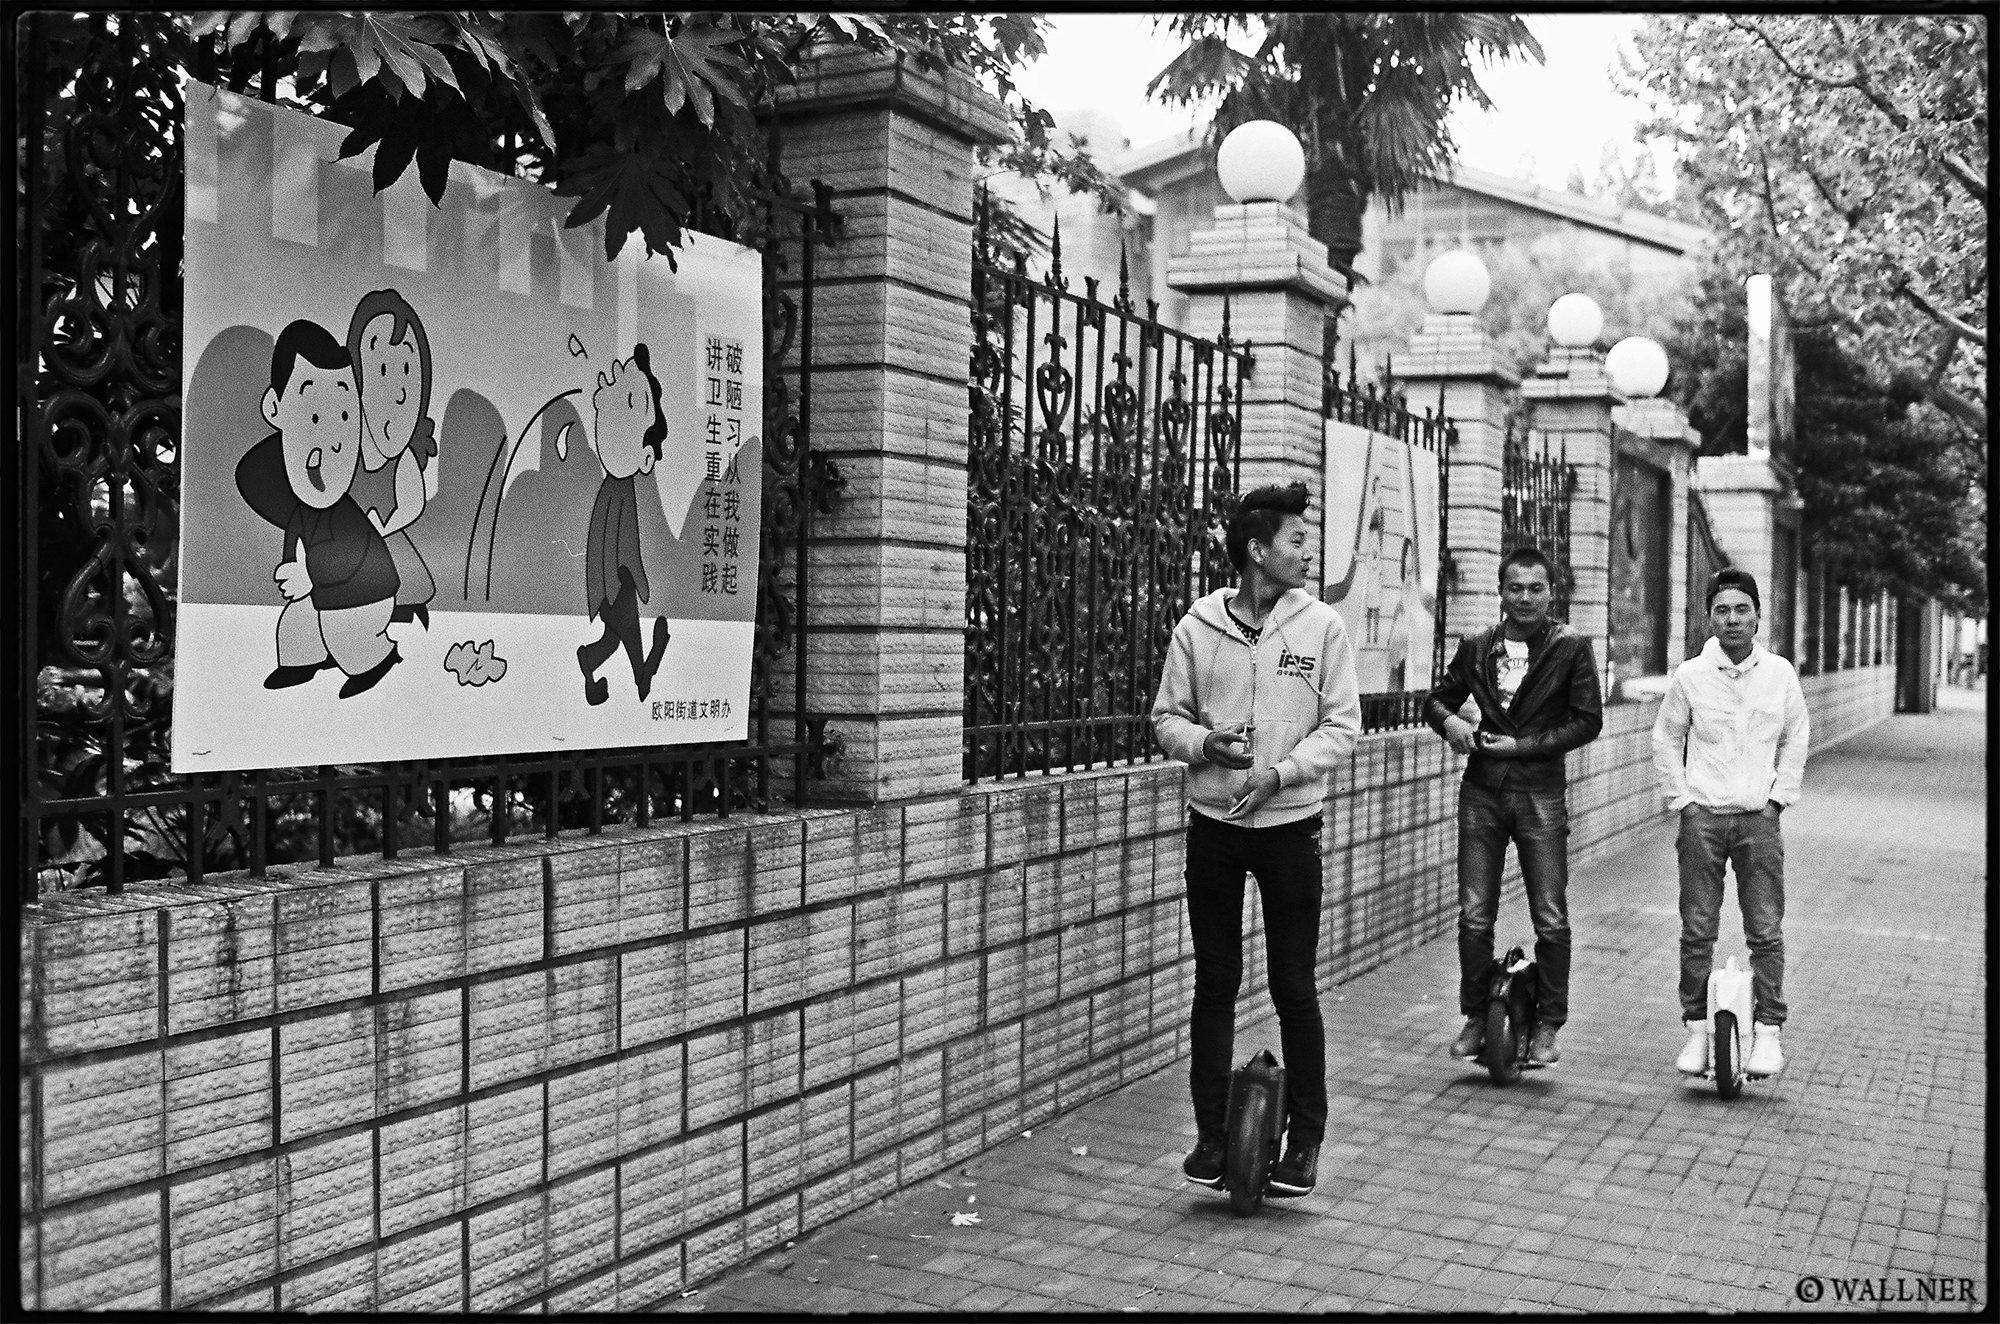 35mmPatrikWallner_Shanghai_FutureChina LOWQ 2000P